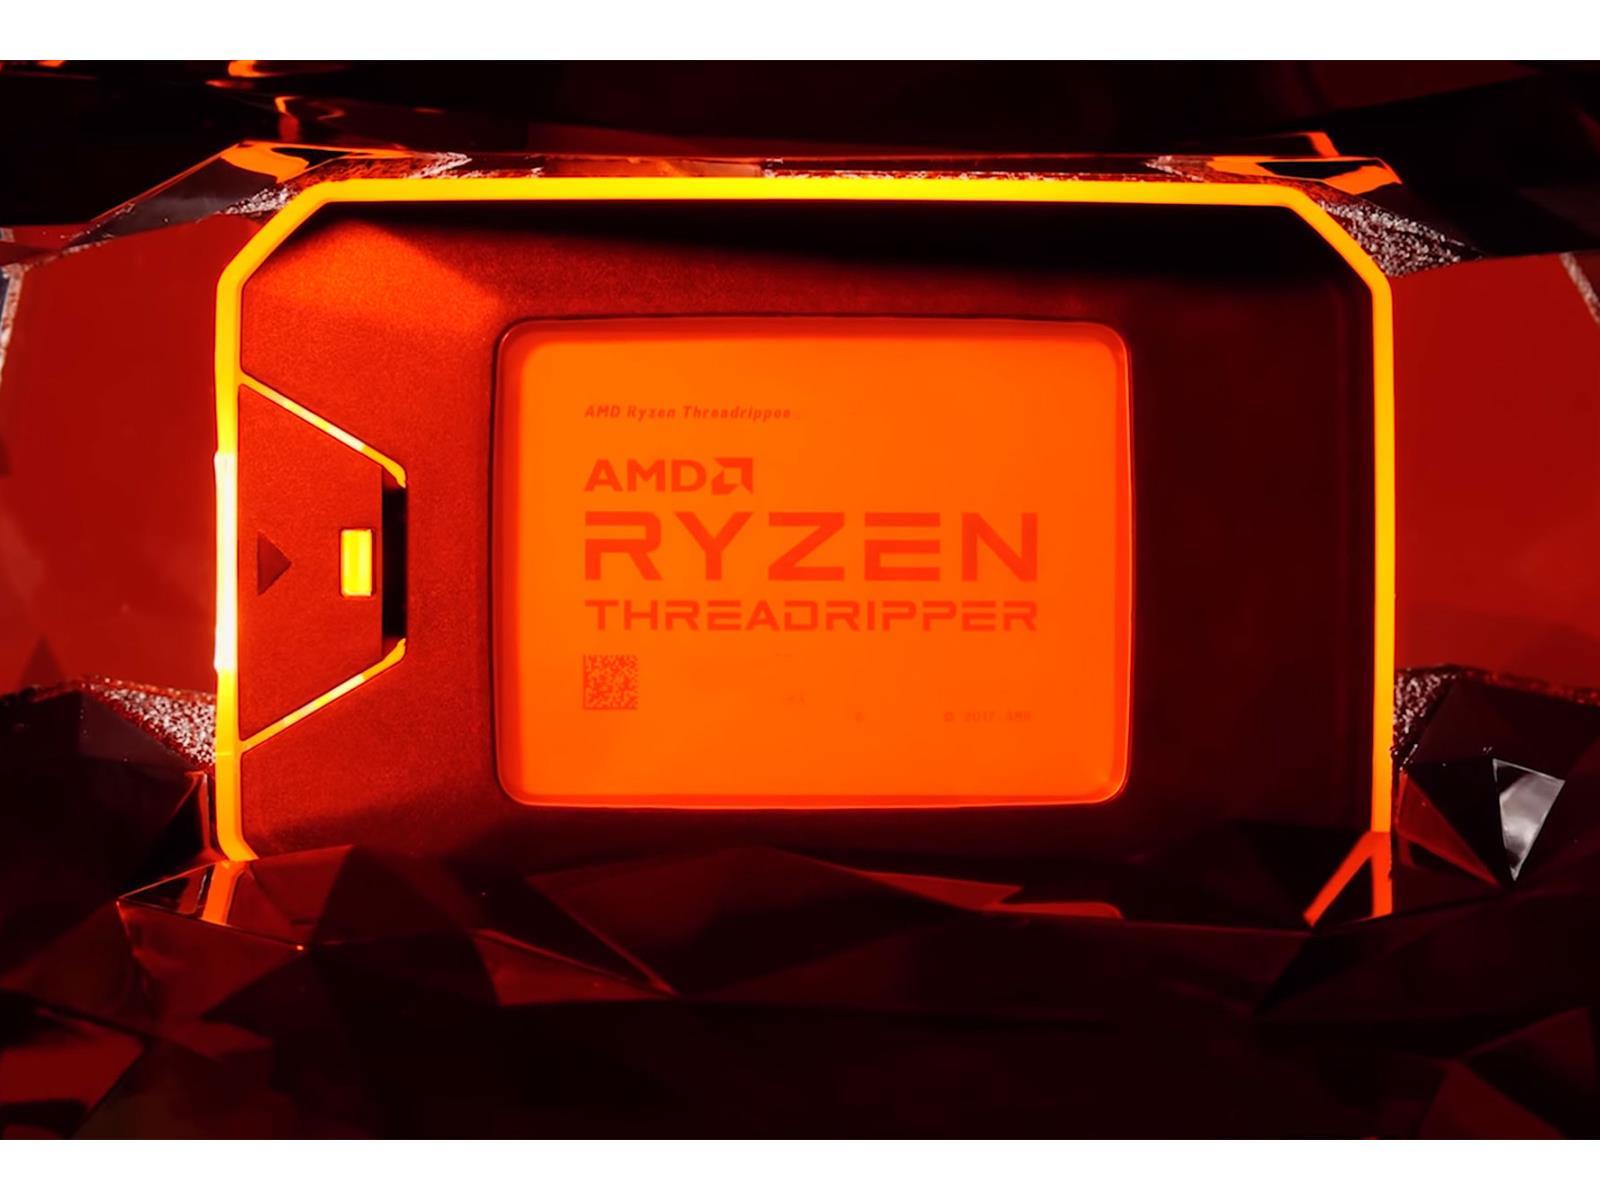 Potential AMD Ryzen Threadripper 3000 16-Core CPU Spotted In